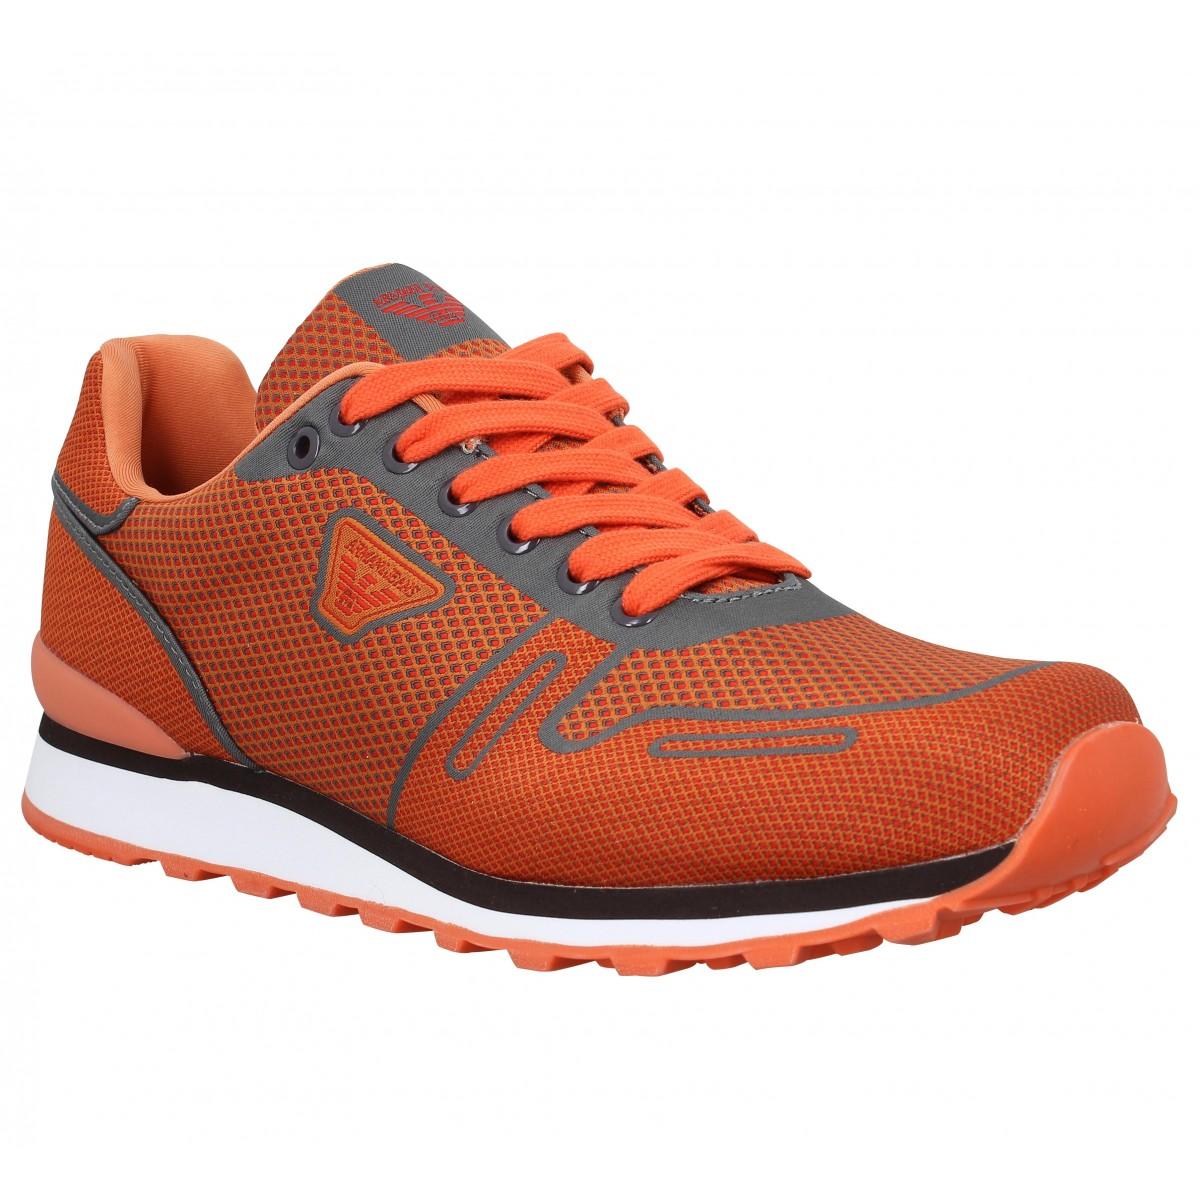 Armani Jeans Marque 9326-40-orange